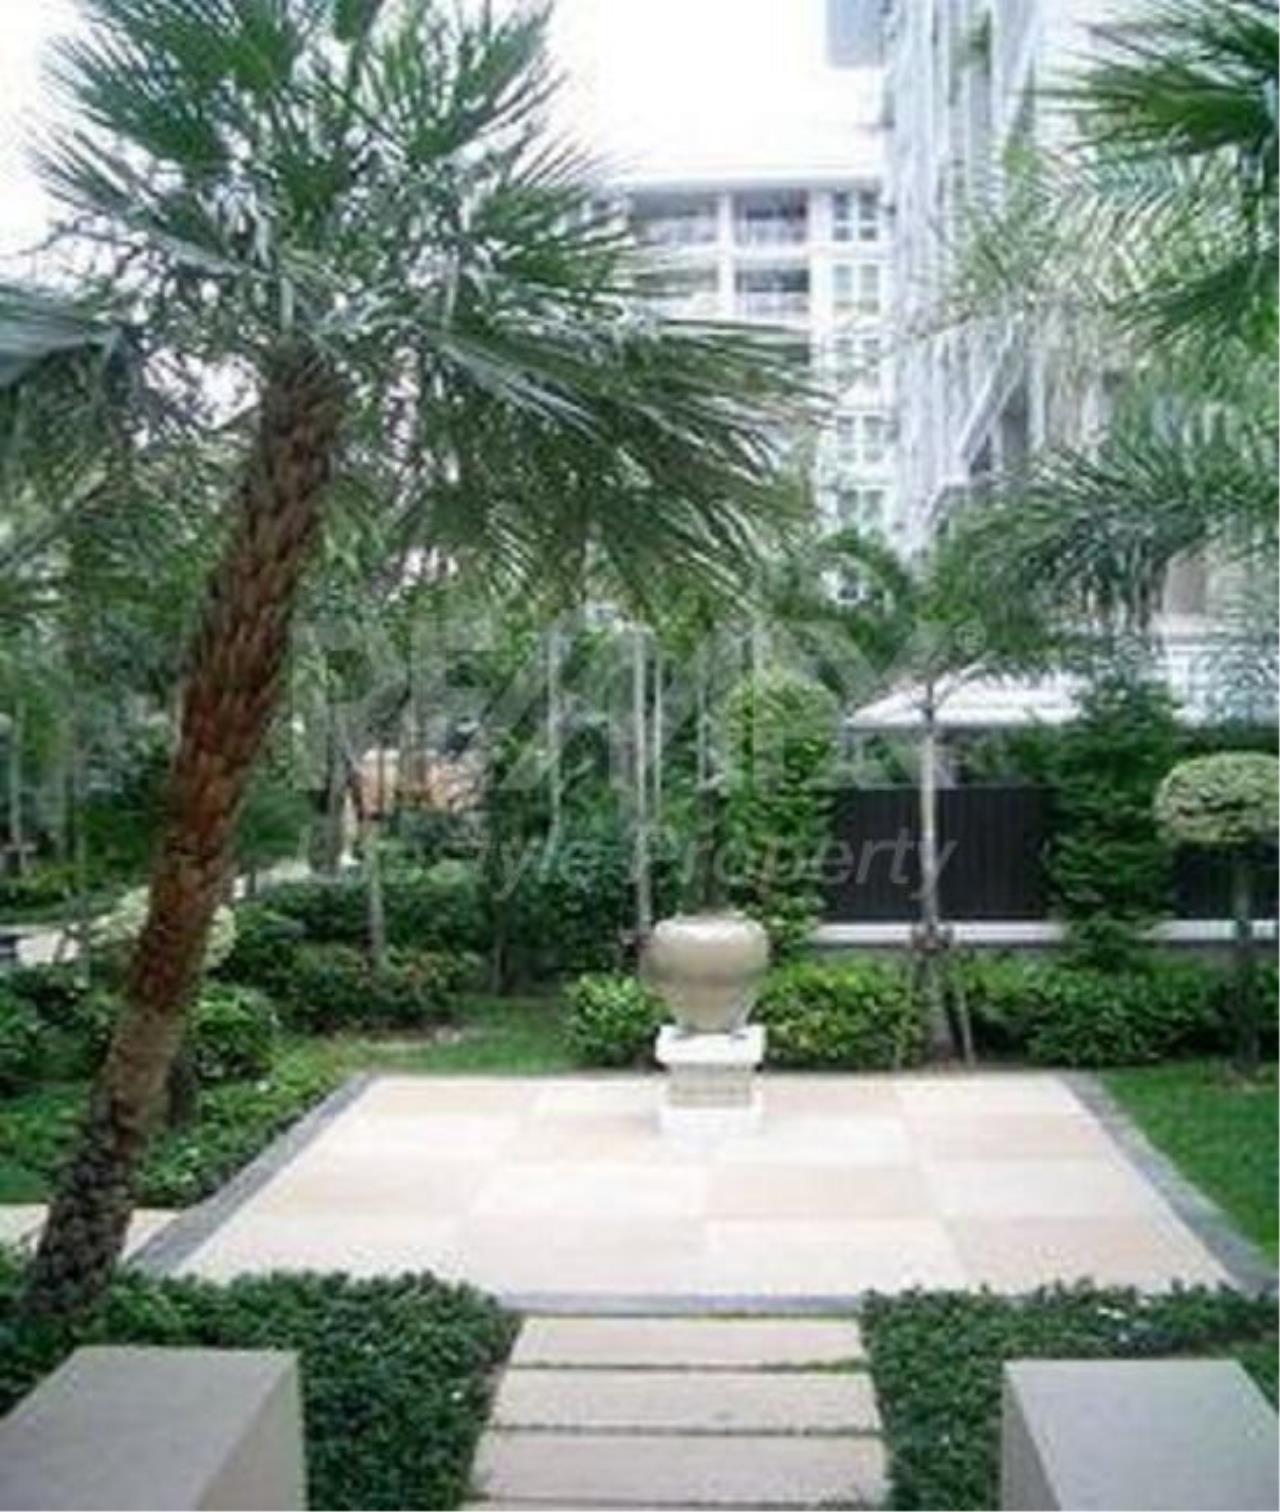 RE/MAX LifeStyle Property Agency's The Bangkok Narathiwas Ratchanakarint 2